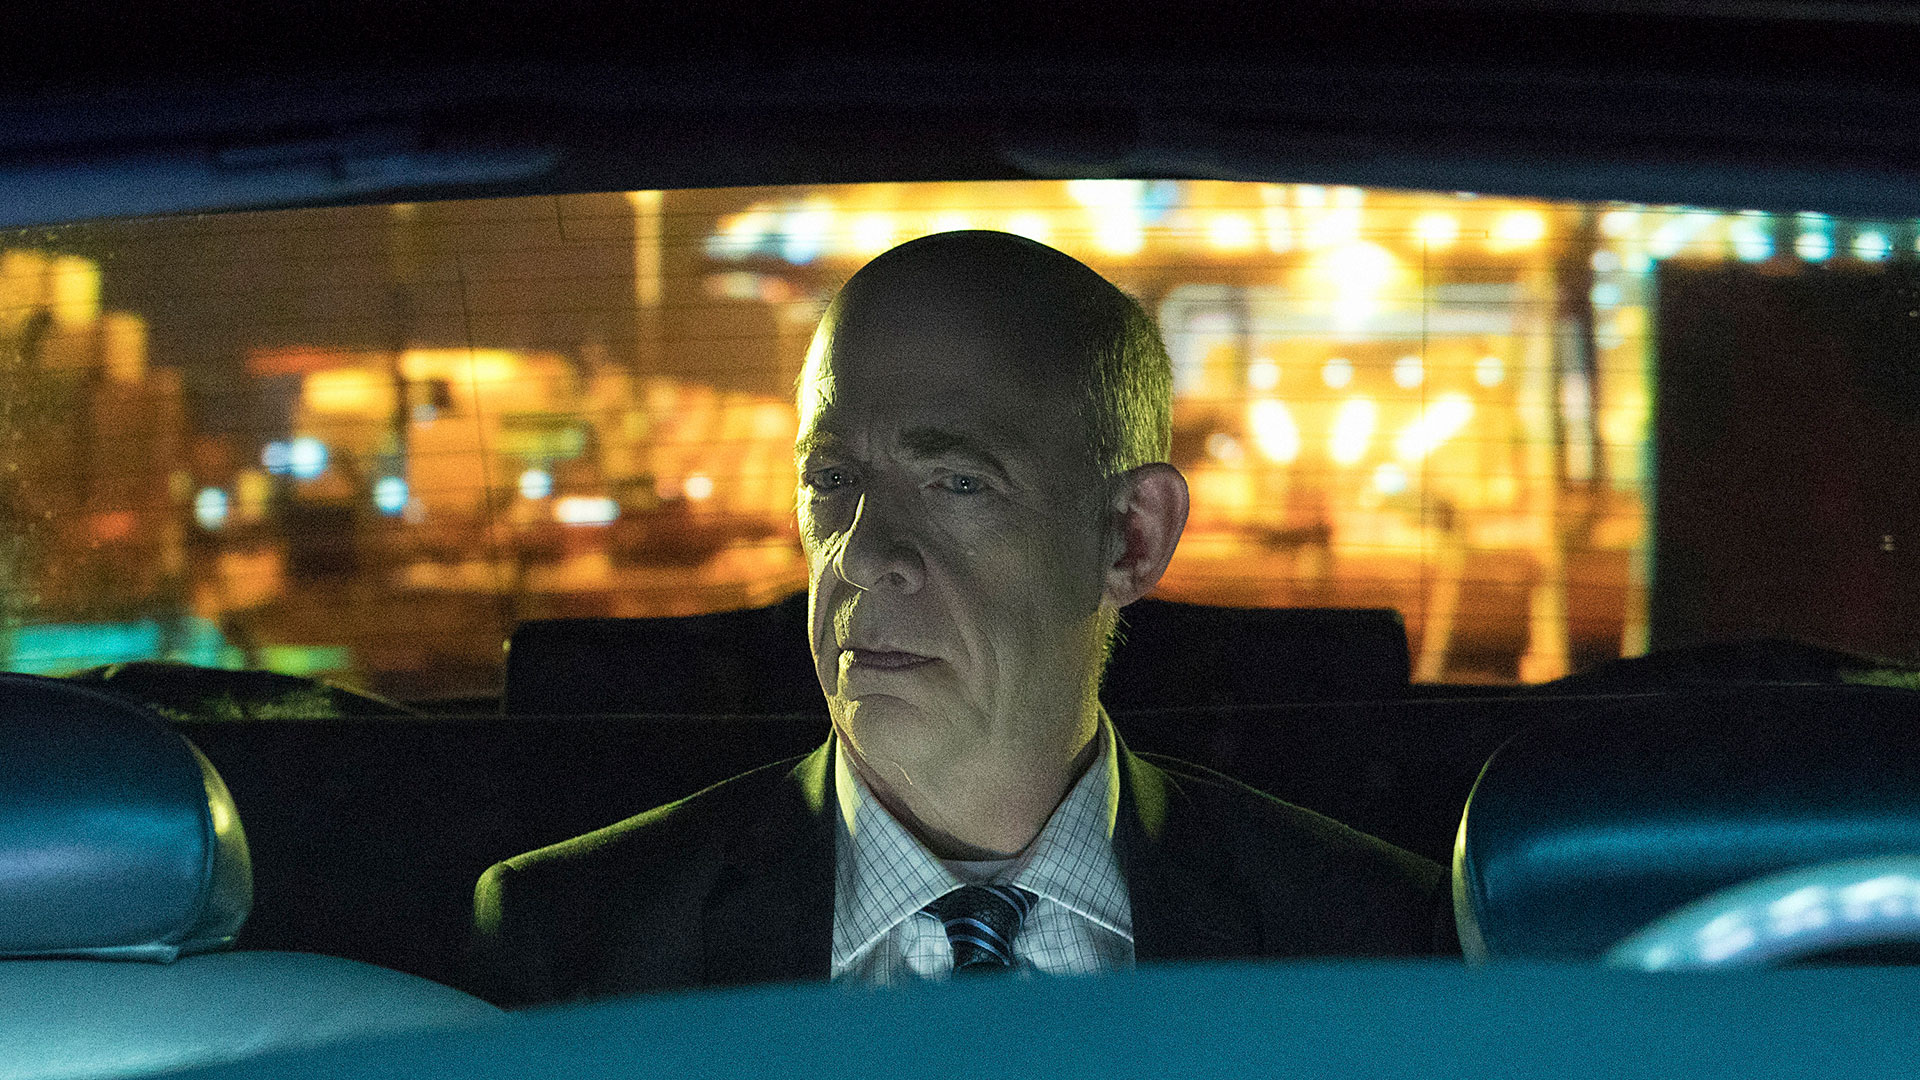 J.K. Simmons as Leon